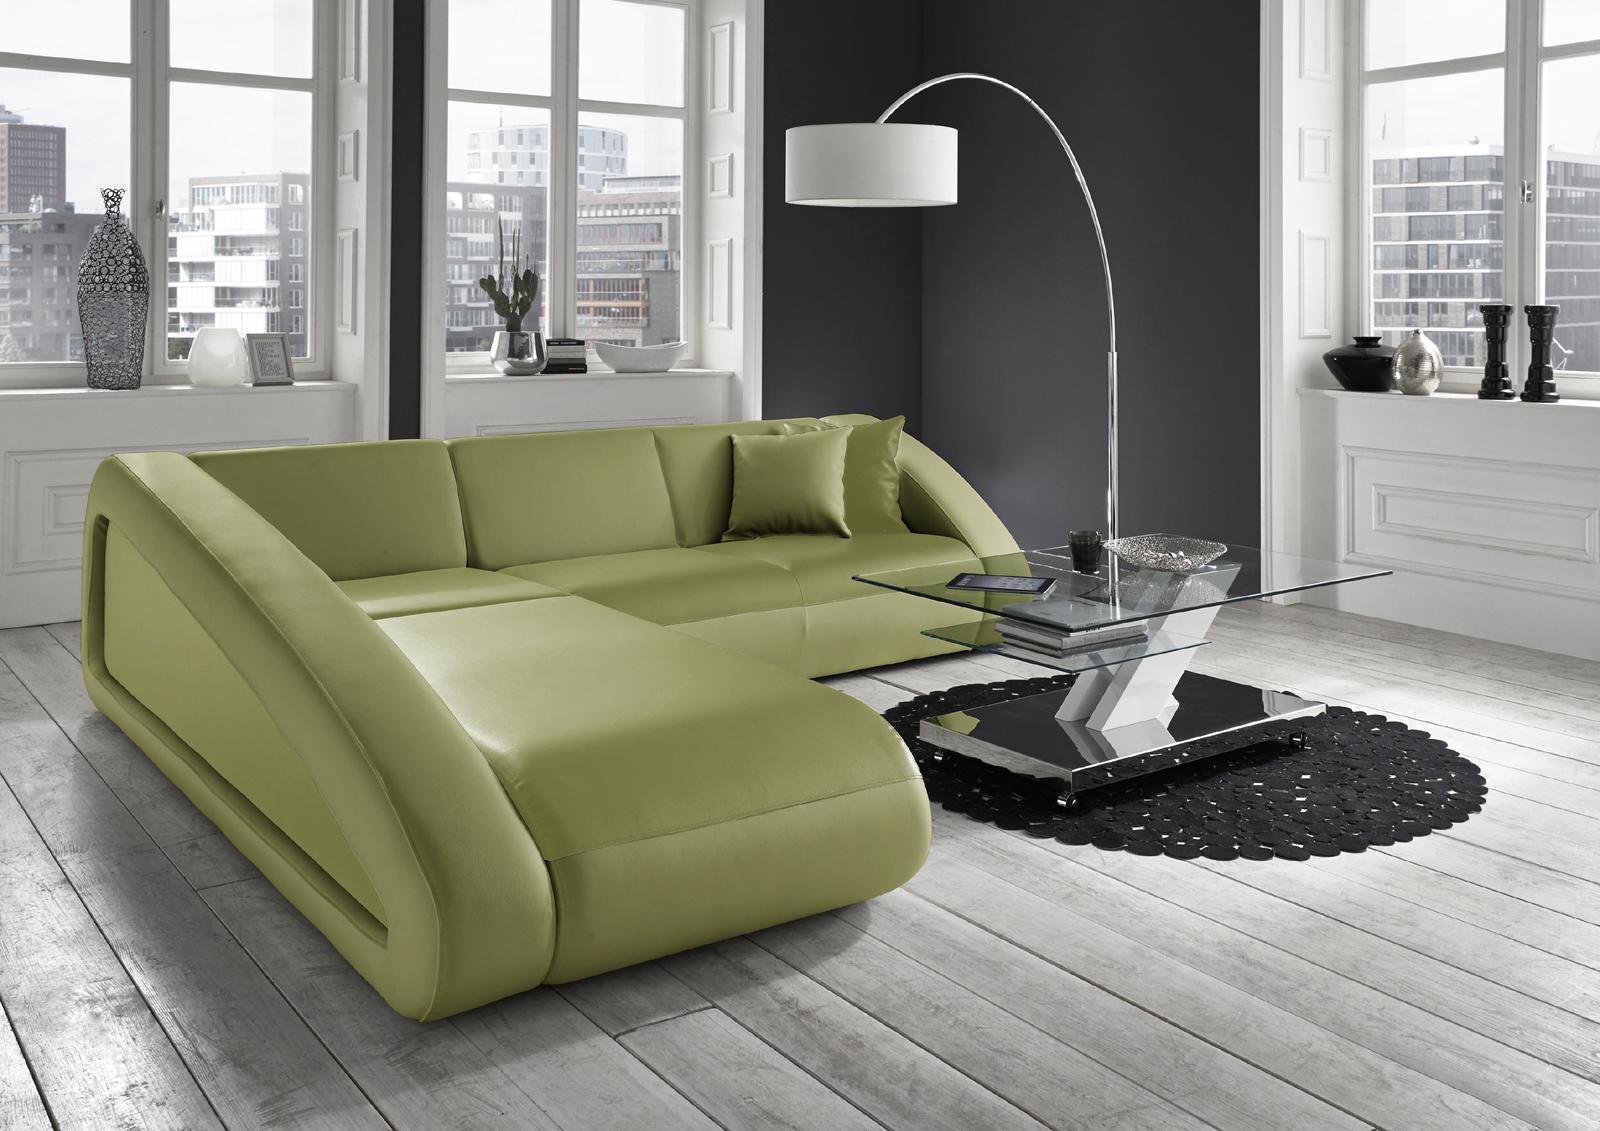 sam design ecksofa farbauswahl ciao uni 250 x 270 cm. Black Bedroom Furniture Sets. Home Design Ideas